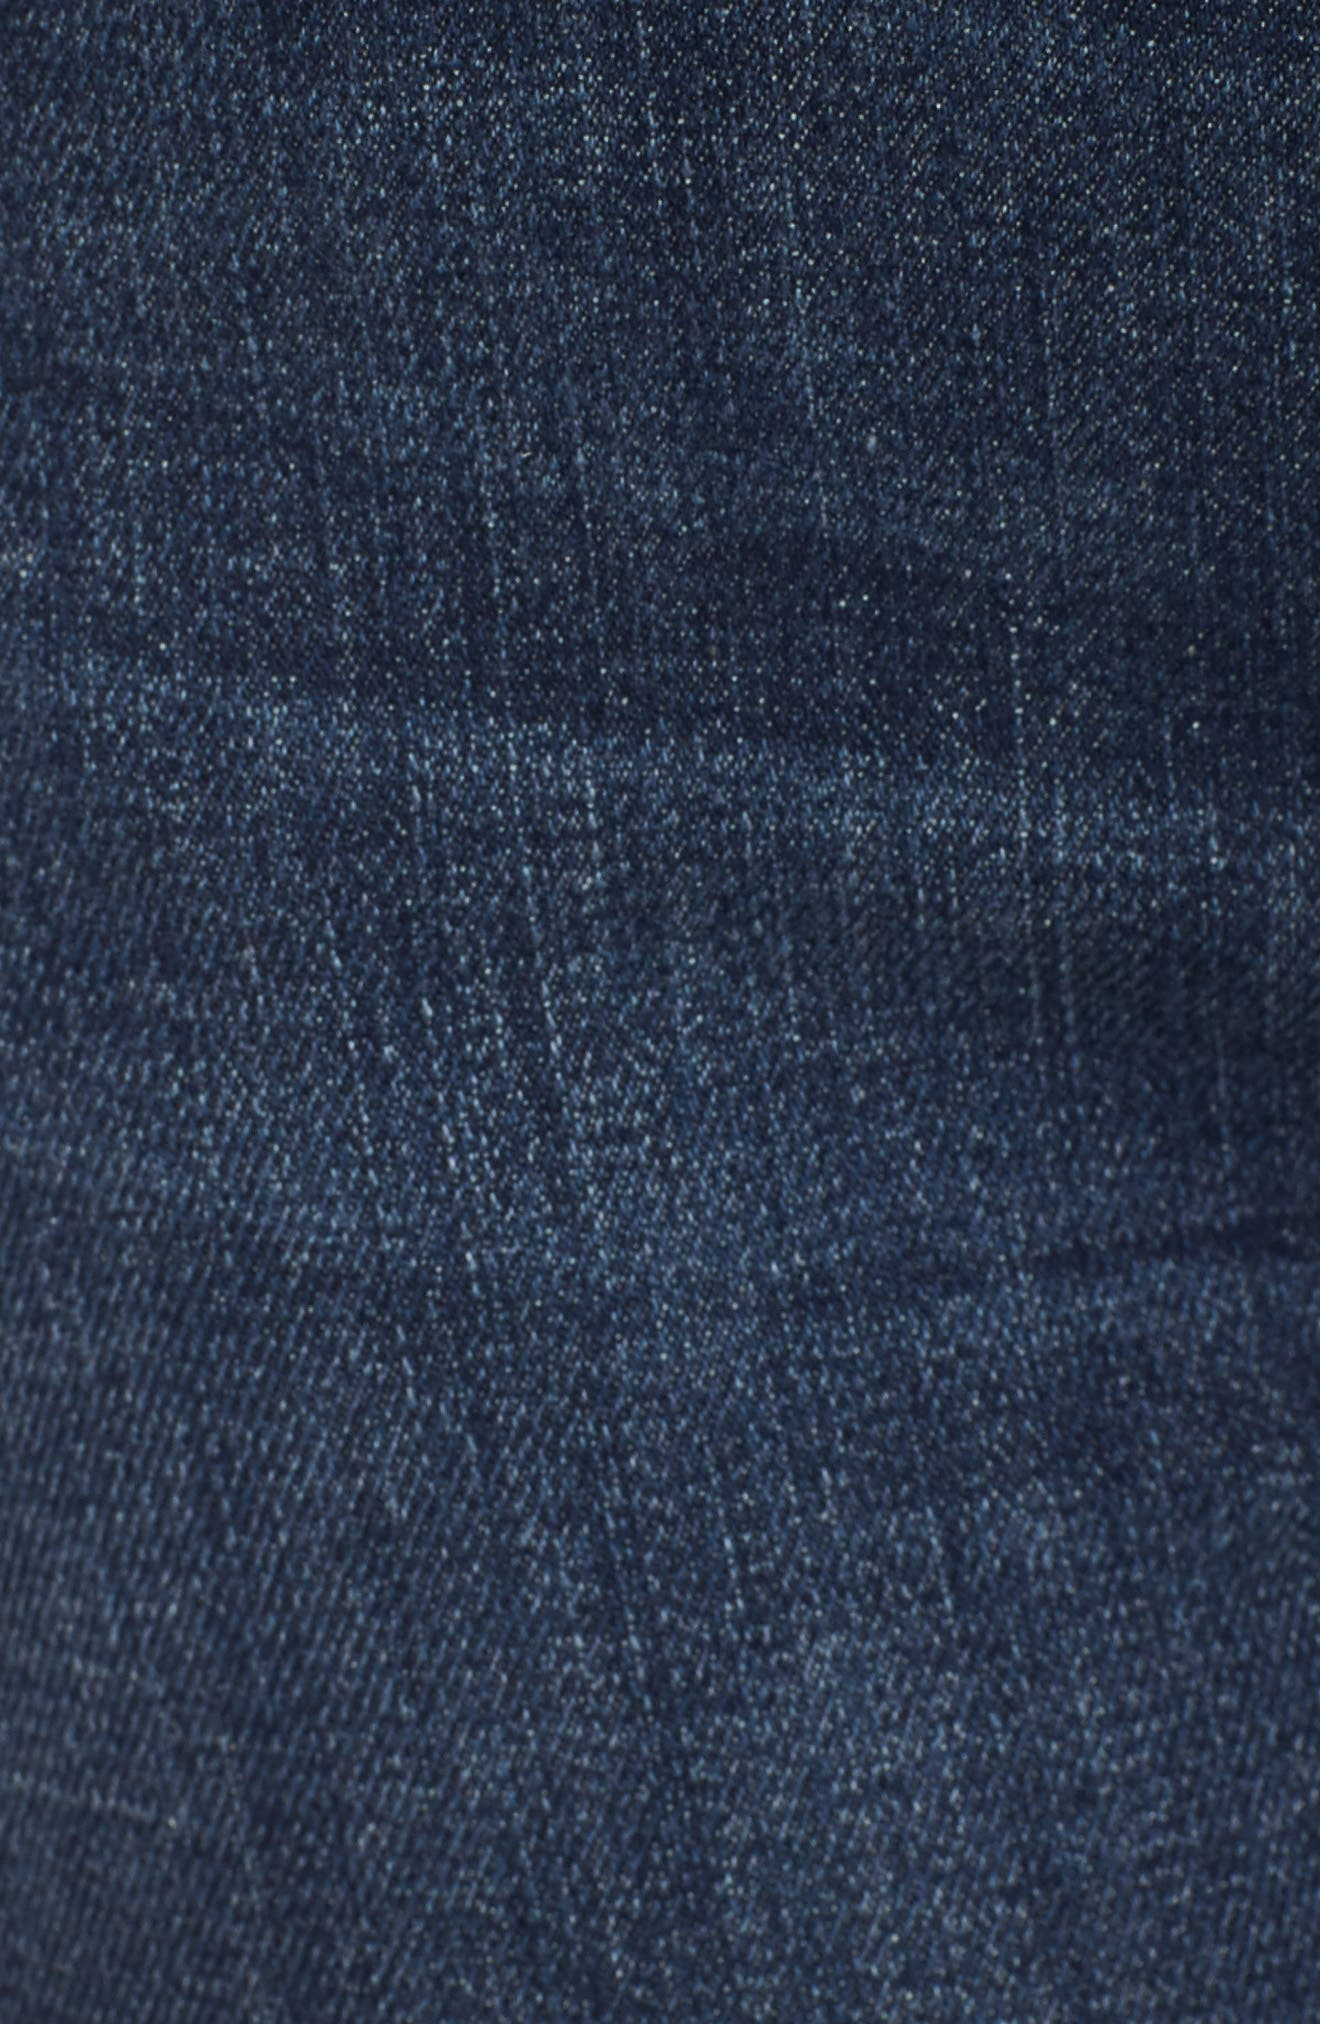 The Charmer Fray Denim Shorts,                             Alternate thumbnail 6, color,                             417